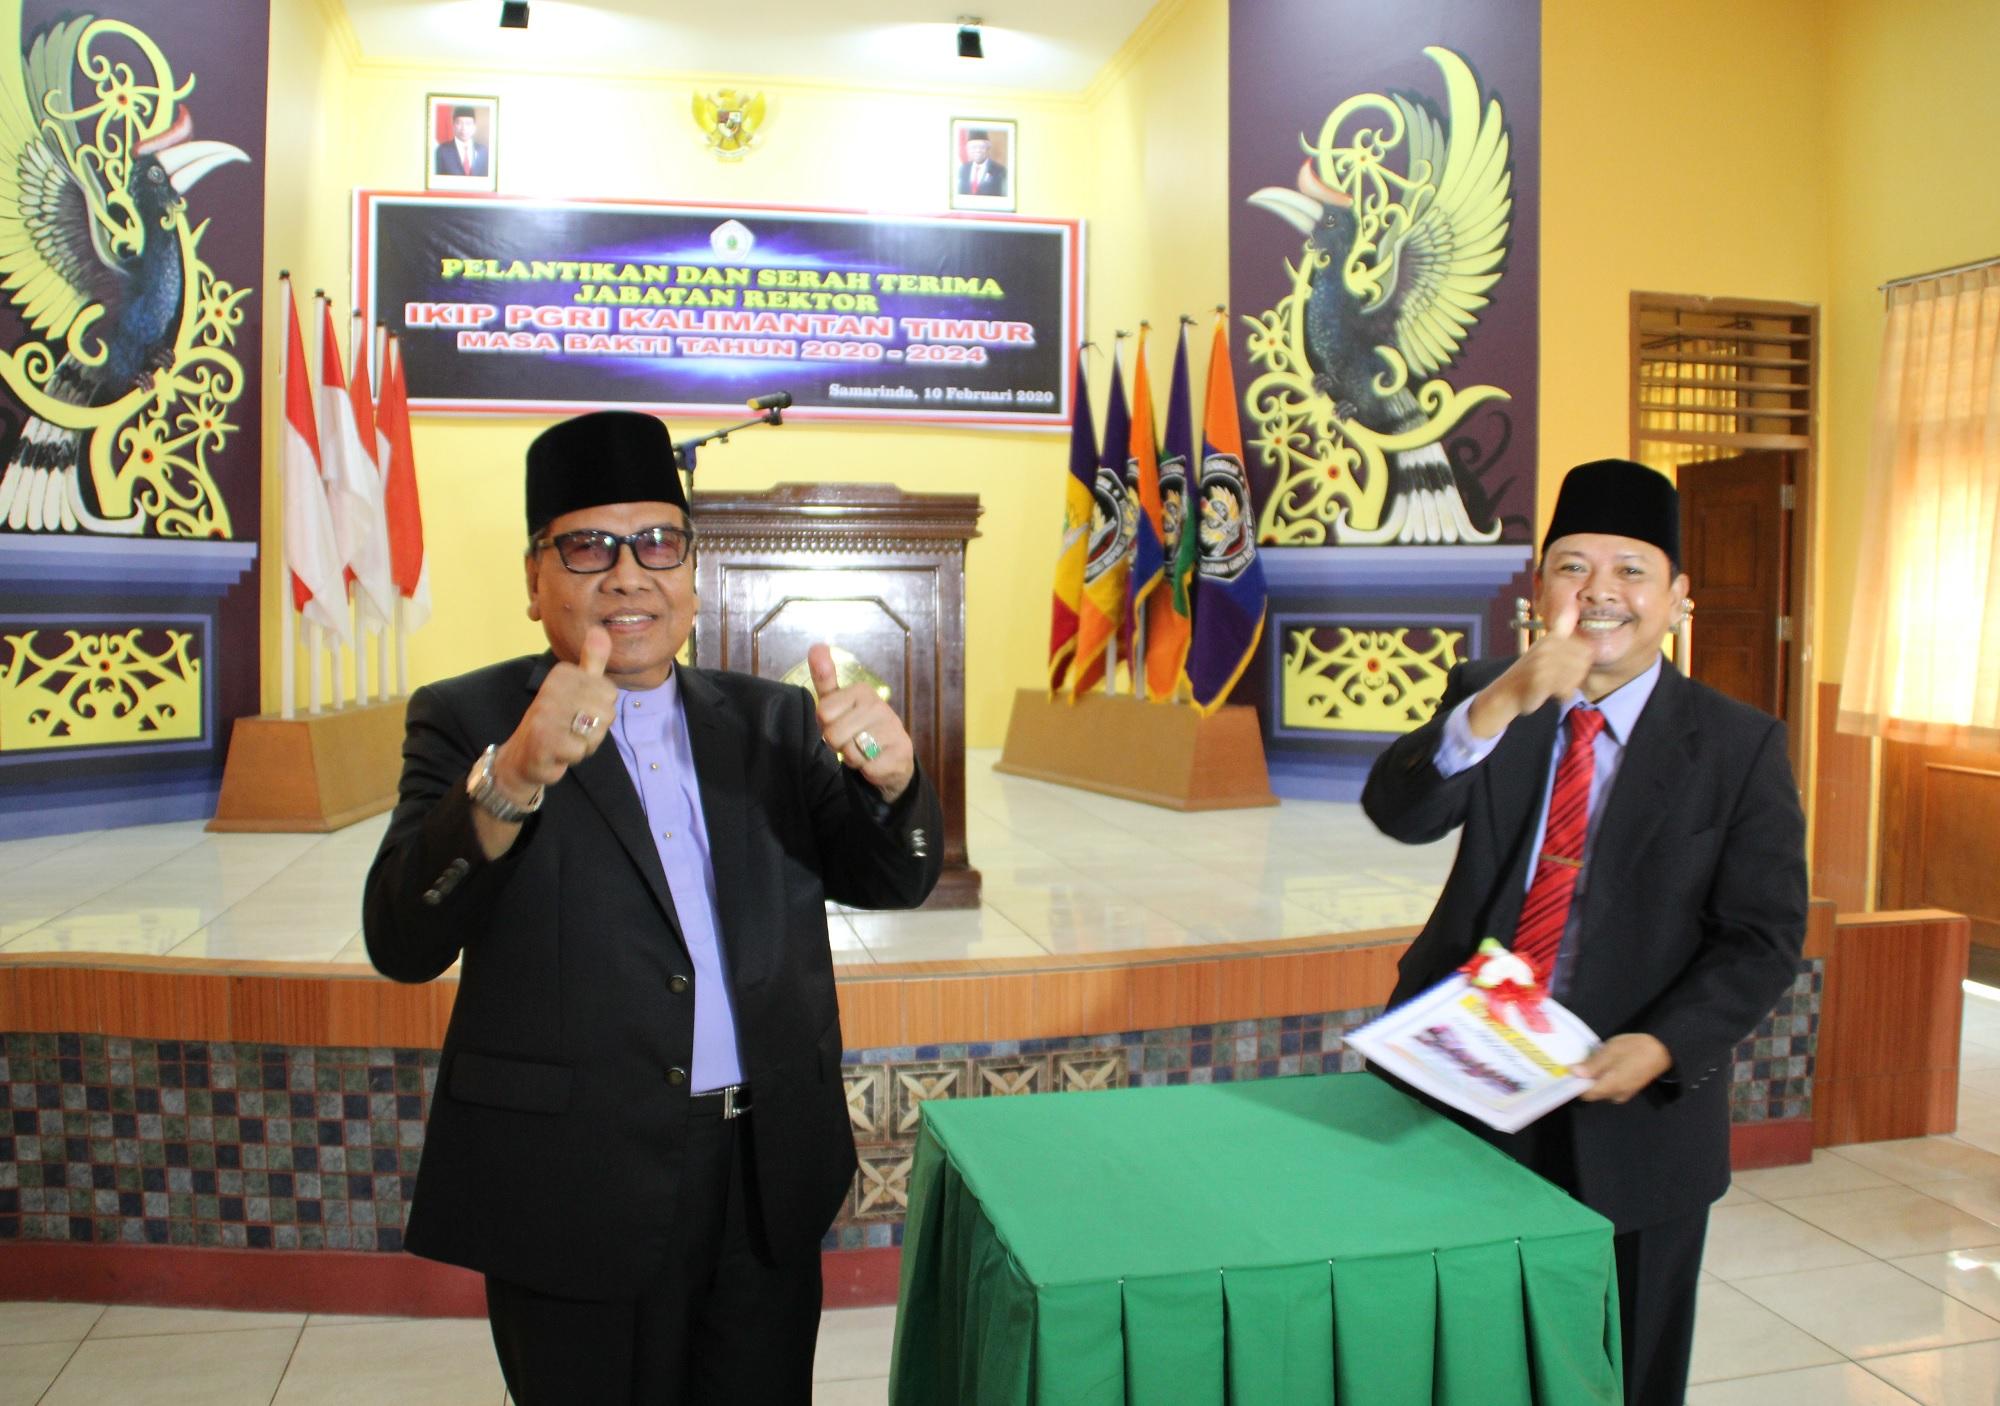 PELANTIKAN REKTOR IKIP PGRI KALIMANTAN TIMUR MASA bHAKTI 2020-2024